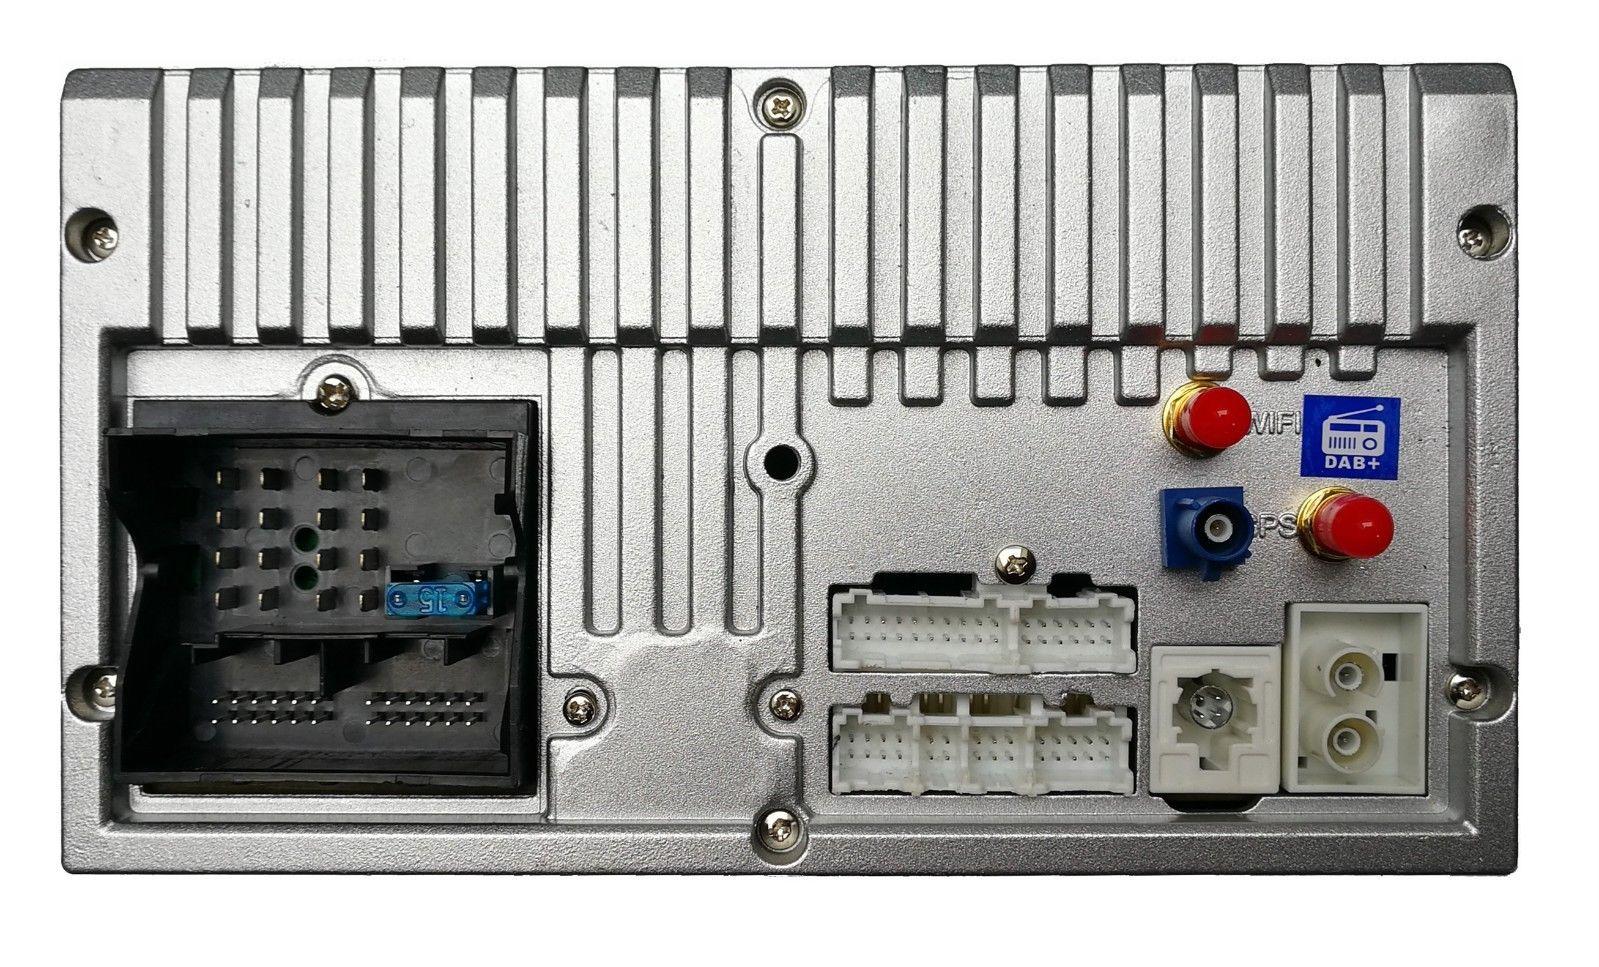 AV8V4 Pro - naviceivers Webseite!